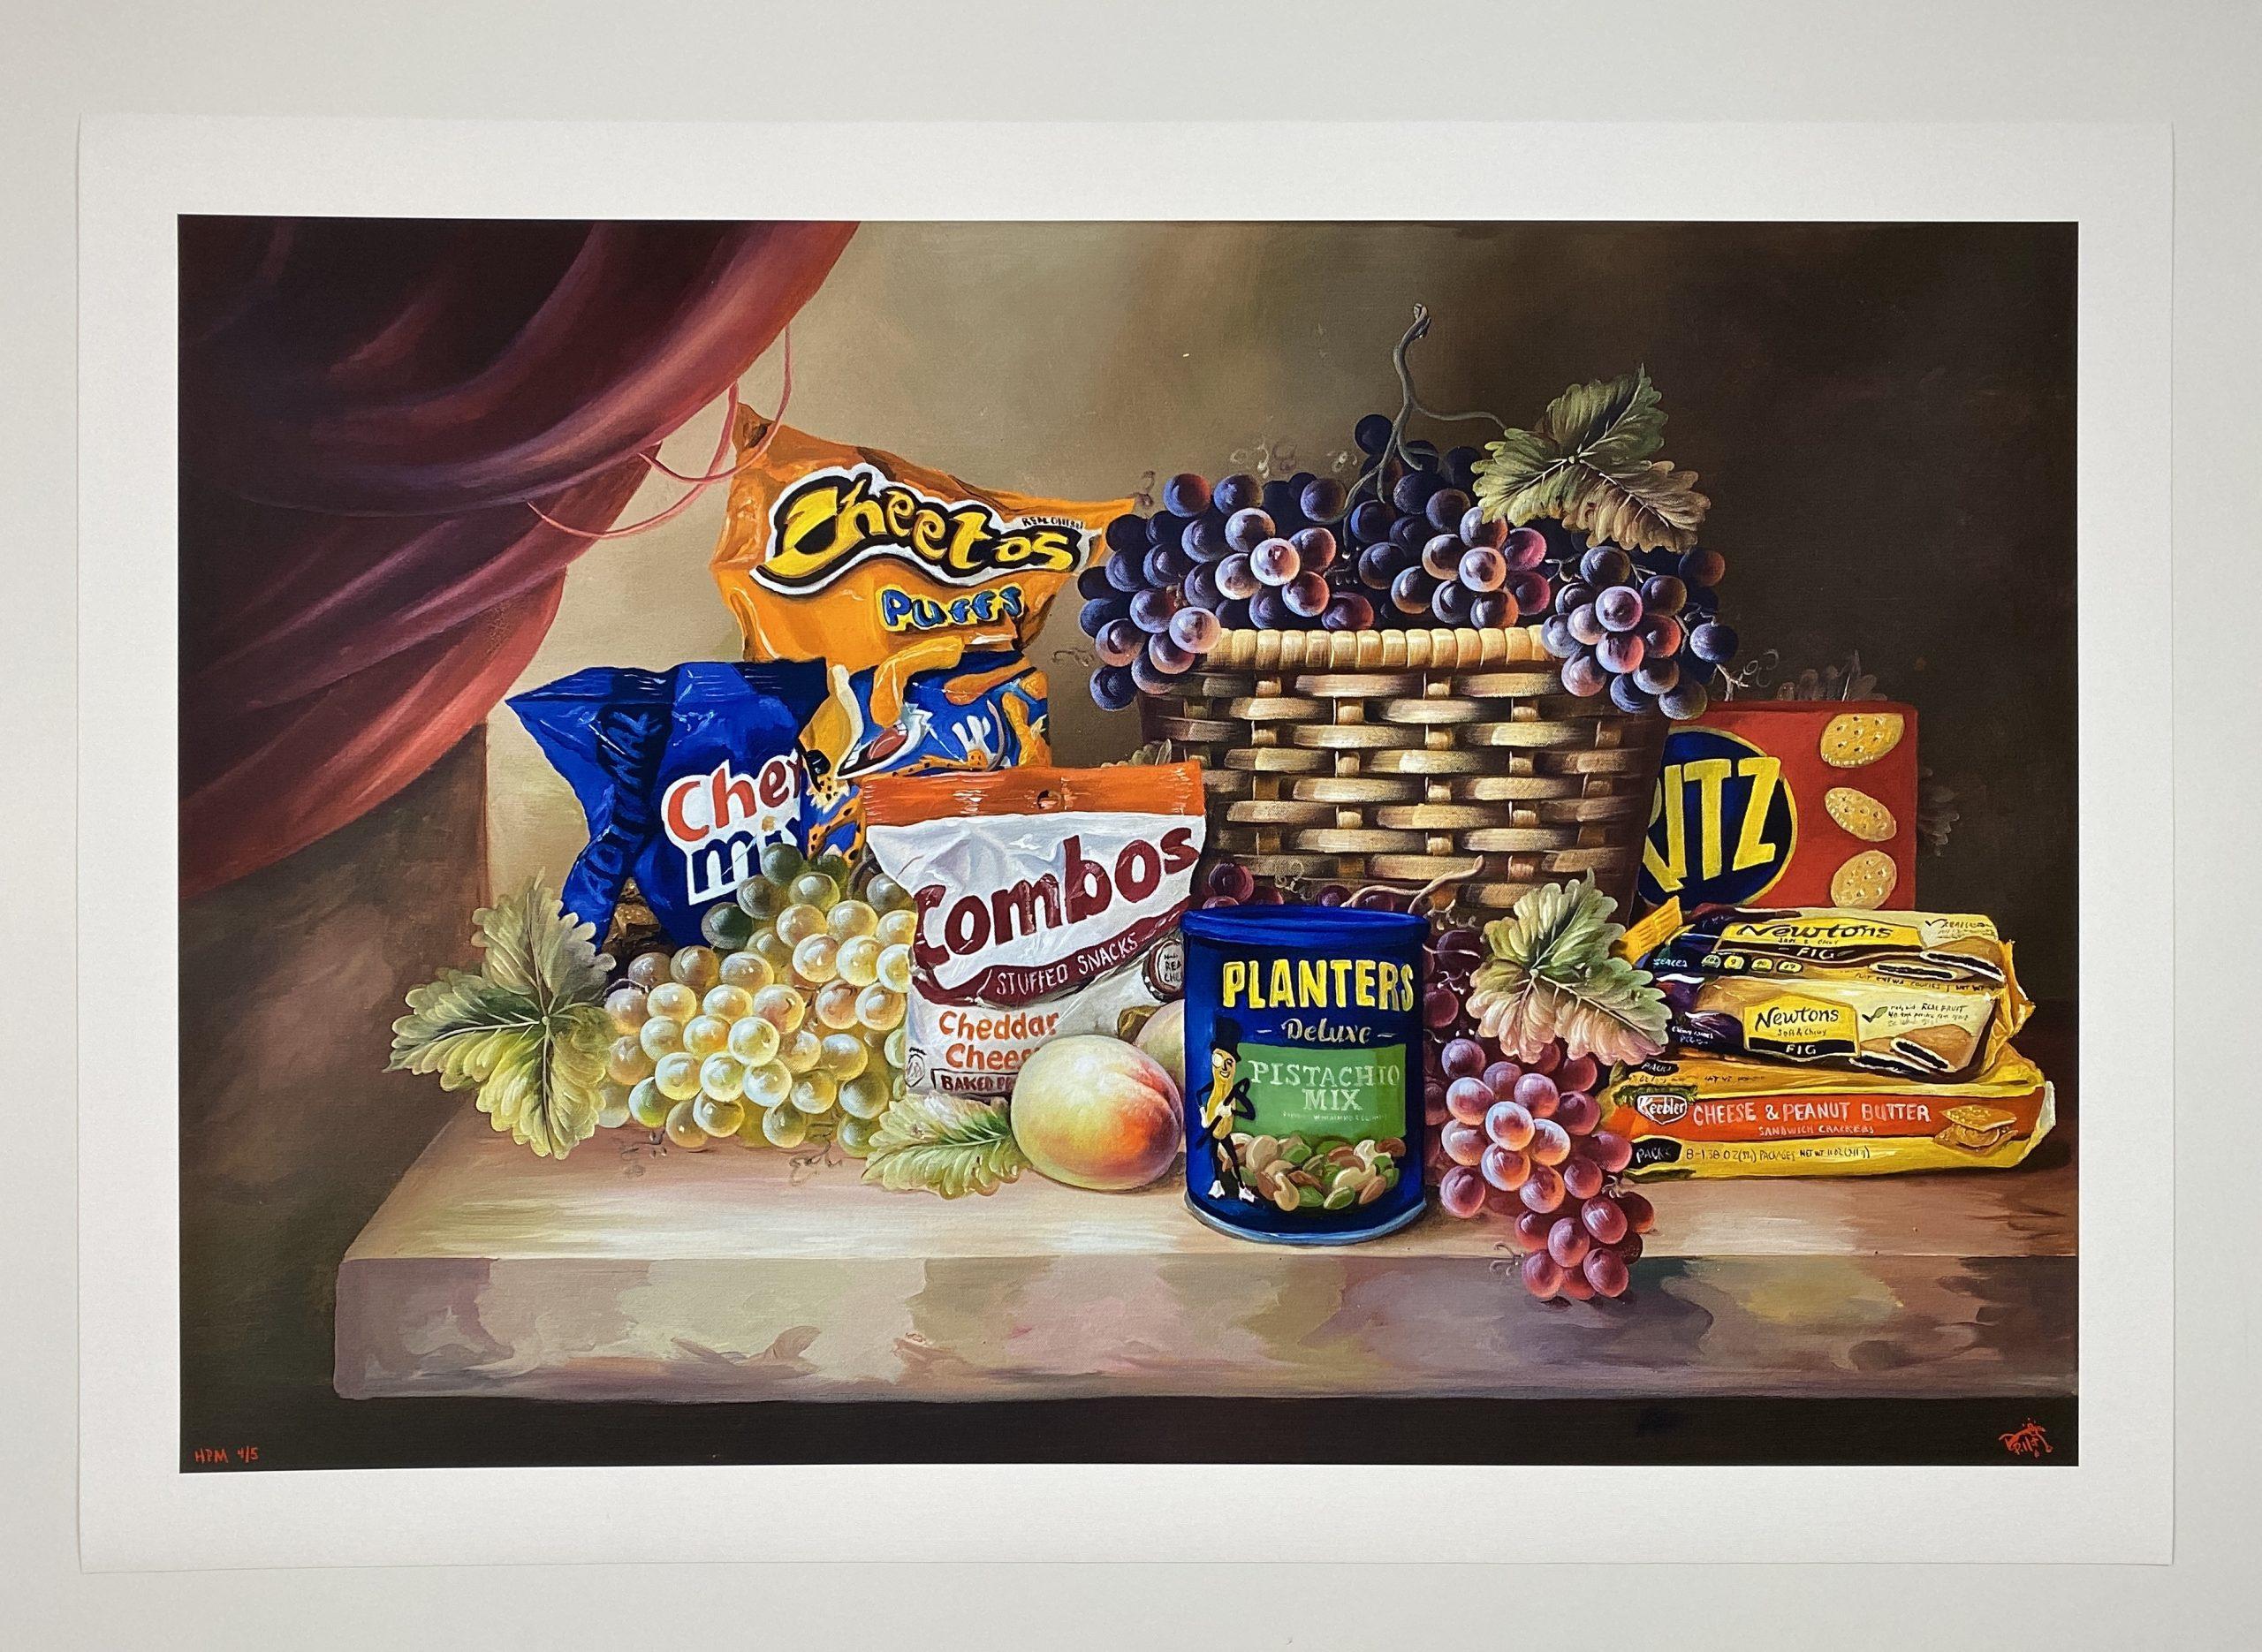 Shelf Life II (Pistachio Deluxe) by Dave Pollot